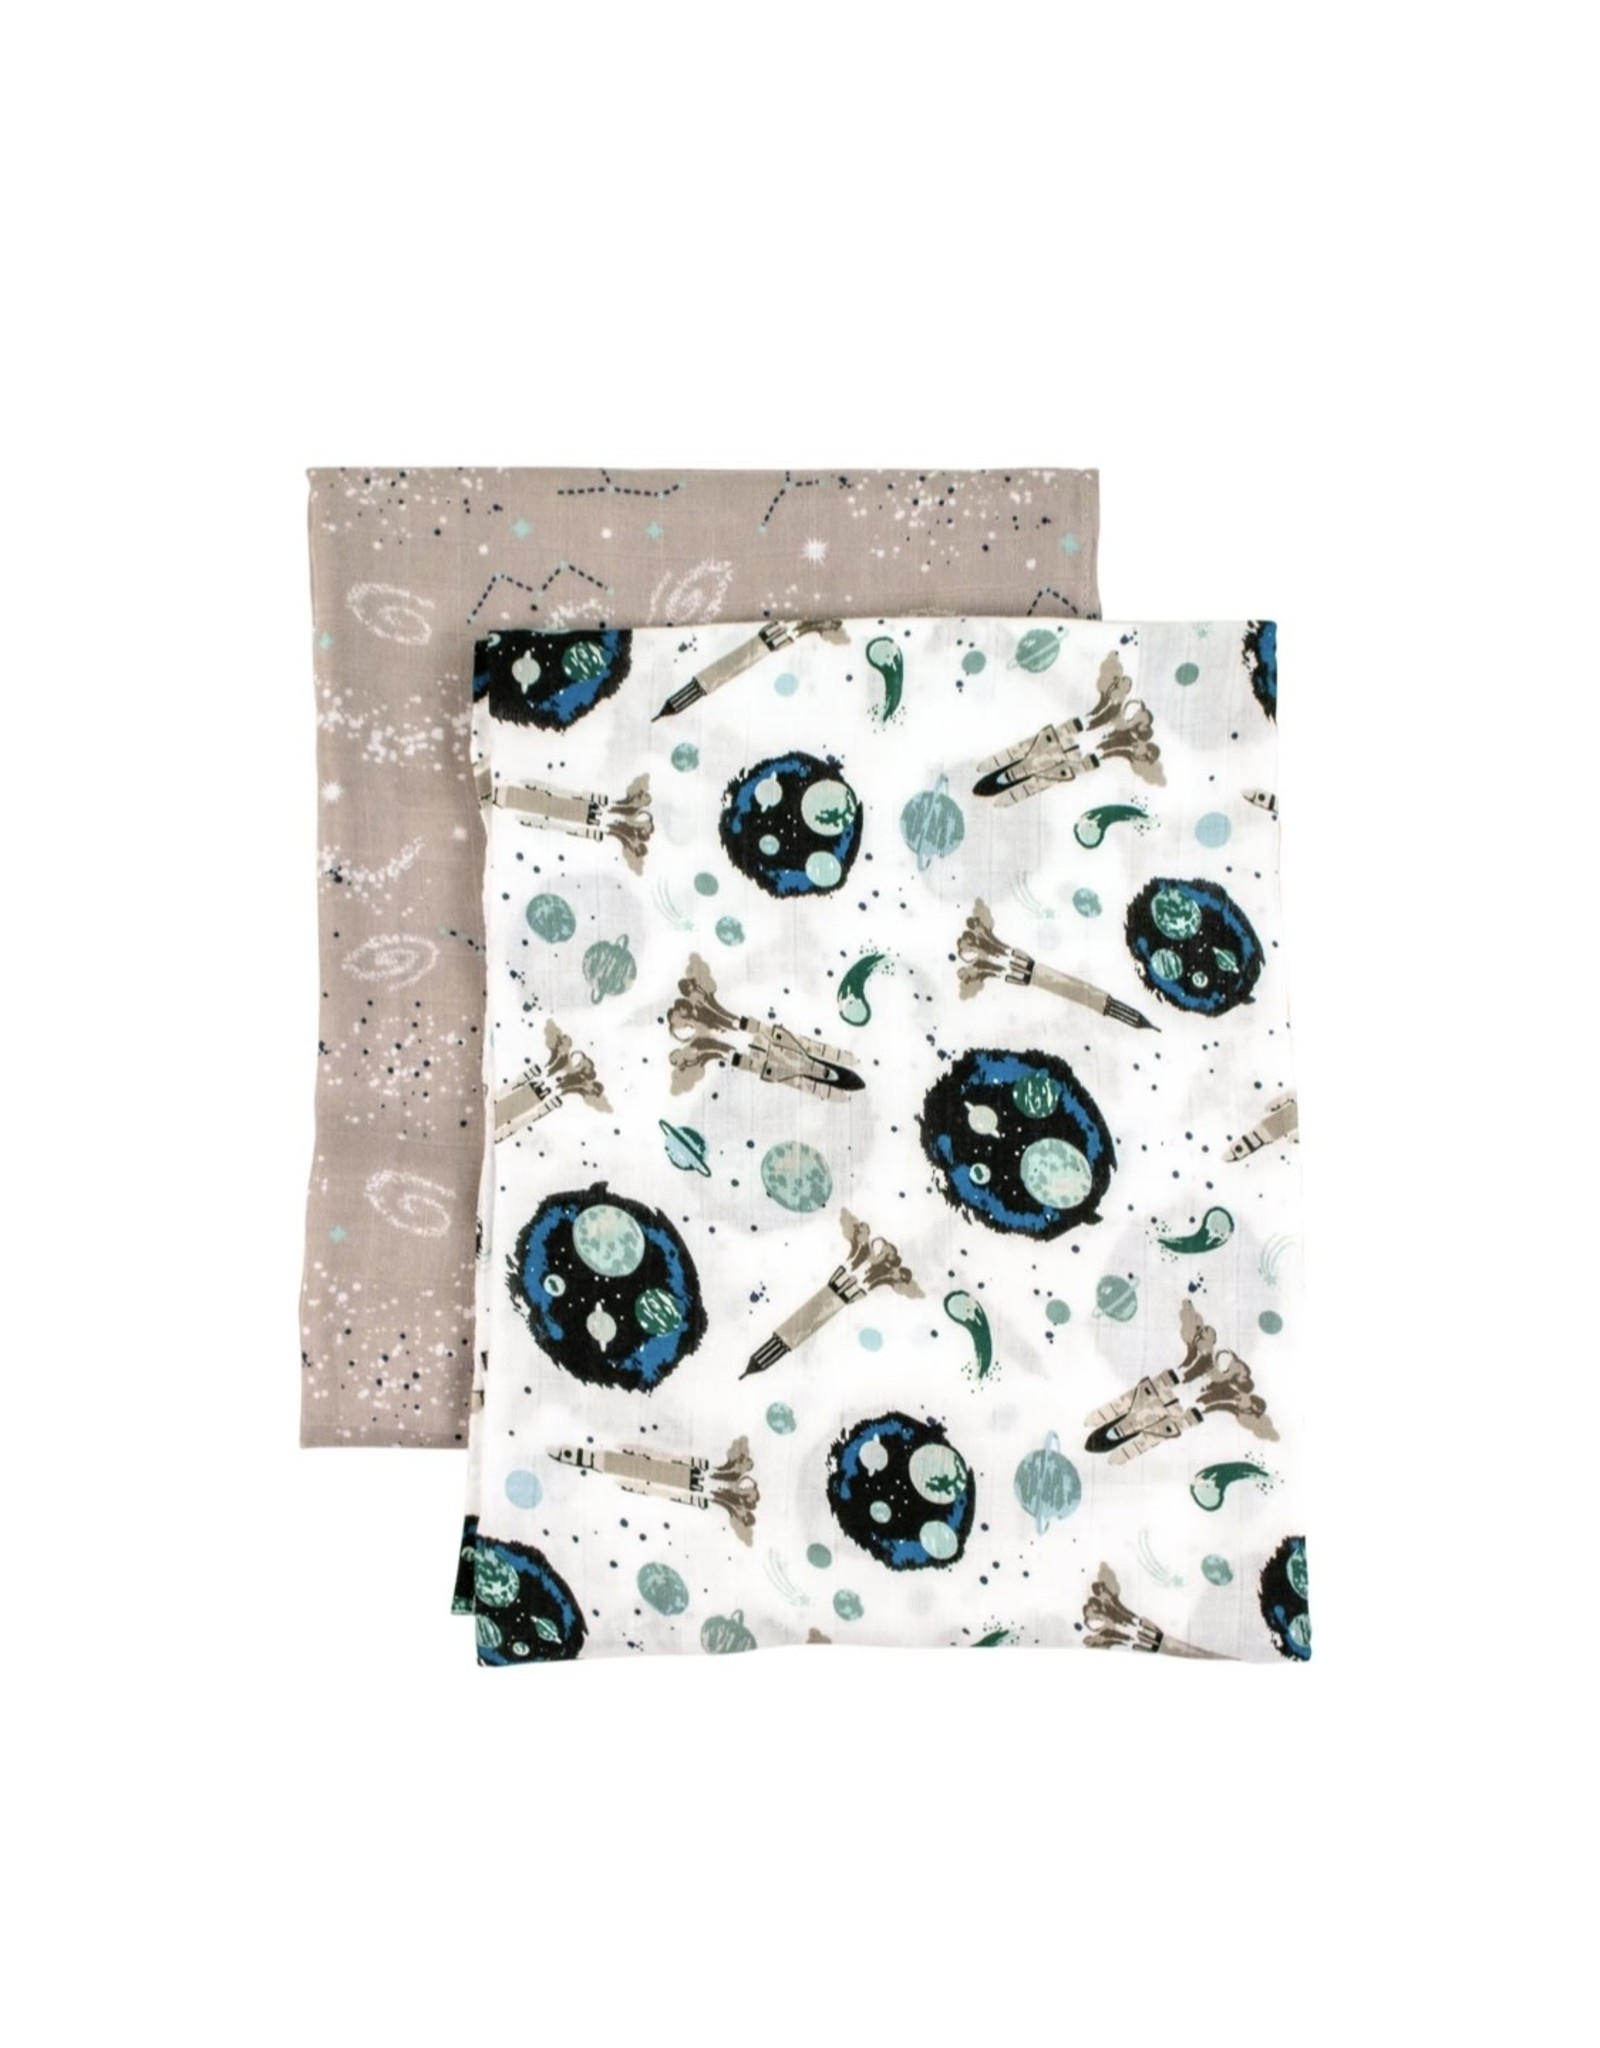 Bebe Au Lait Bebe Au Lait- Space & Galaxy Oh-So-Soft Muslin Swaddle Blanket Set